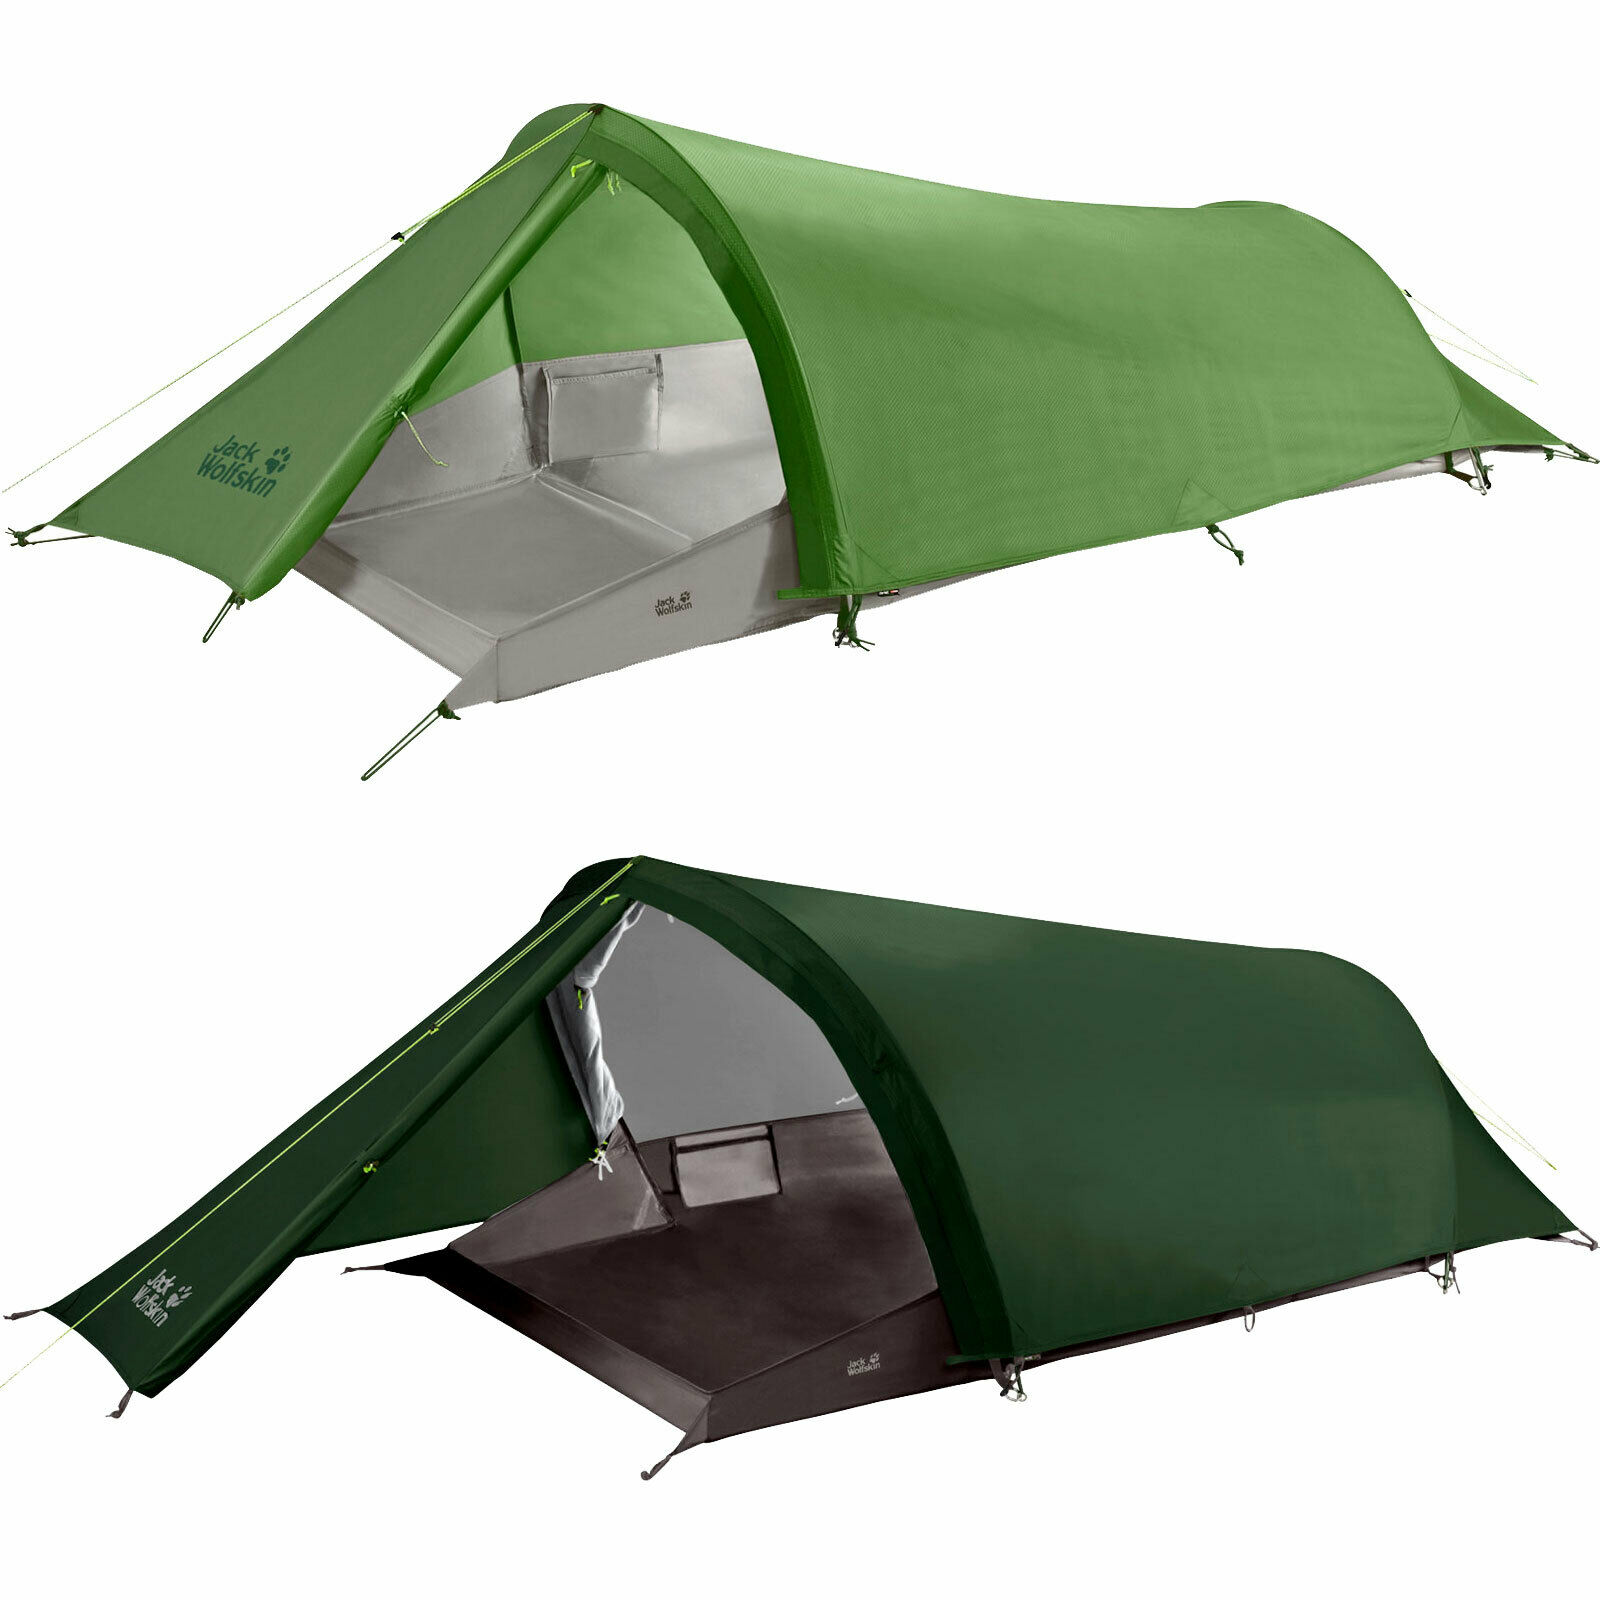 s l1600 - Jack Wolfskin Gossamer Tienda Tunel Excursión Trekking Camping Exterior